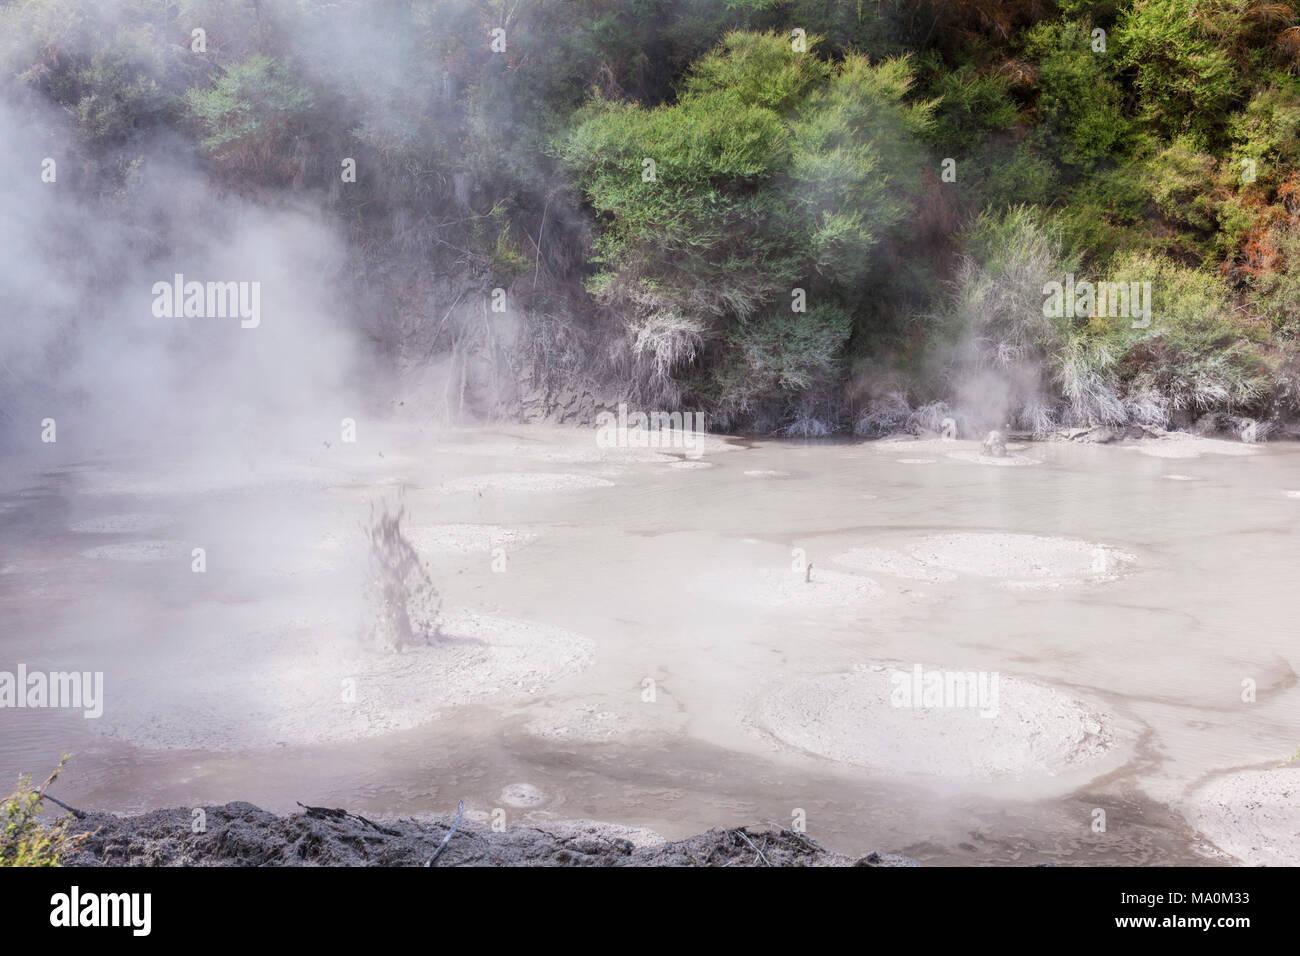 new zealand wai-o-tapu themal wonderland boiling bubbling mud pools mud pots waiotapu rotorua new zealand waiotapu rotorua new zealand - Stock Image